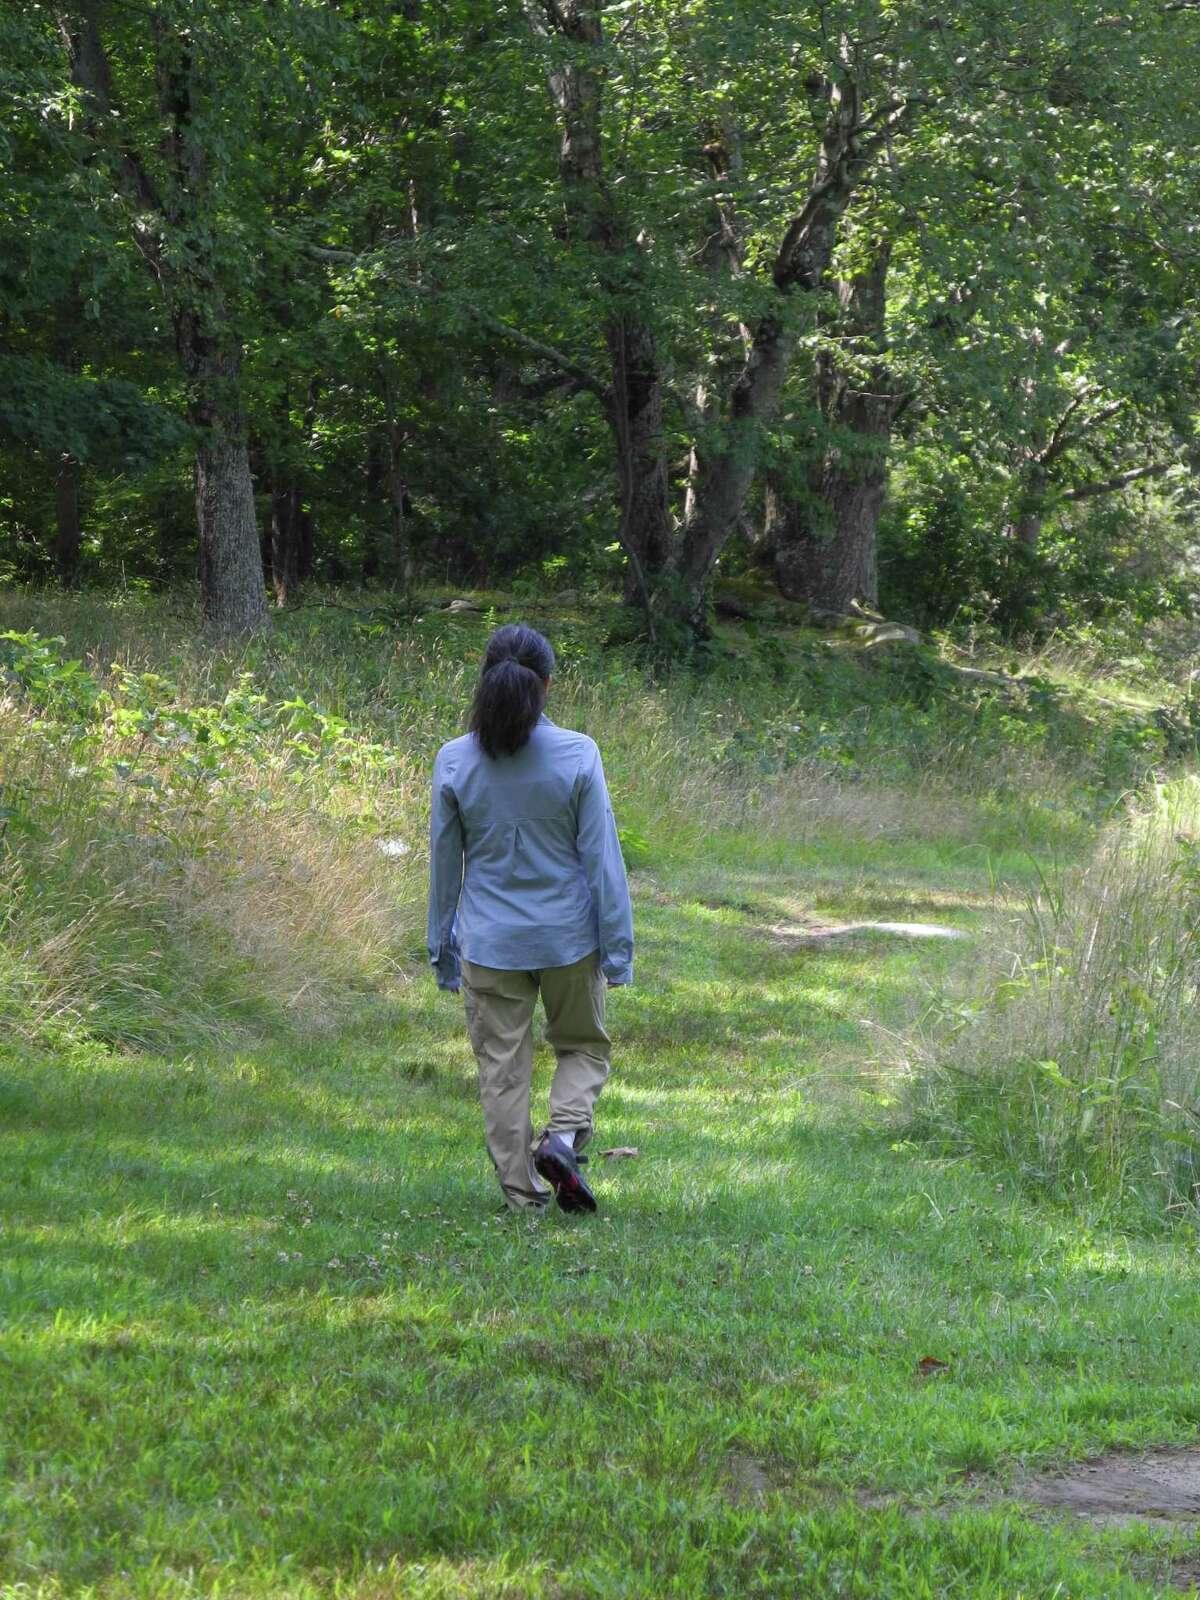 Certified forest bathing guide Jennifer Salkin walks along a meadow trail at Weir Farm National Historic Site in Wilton, Conn., on July 26, 2019.